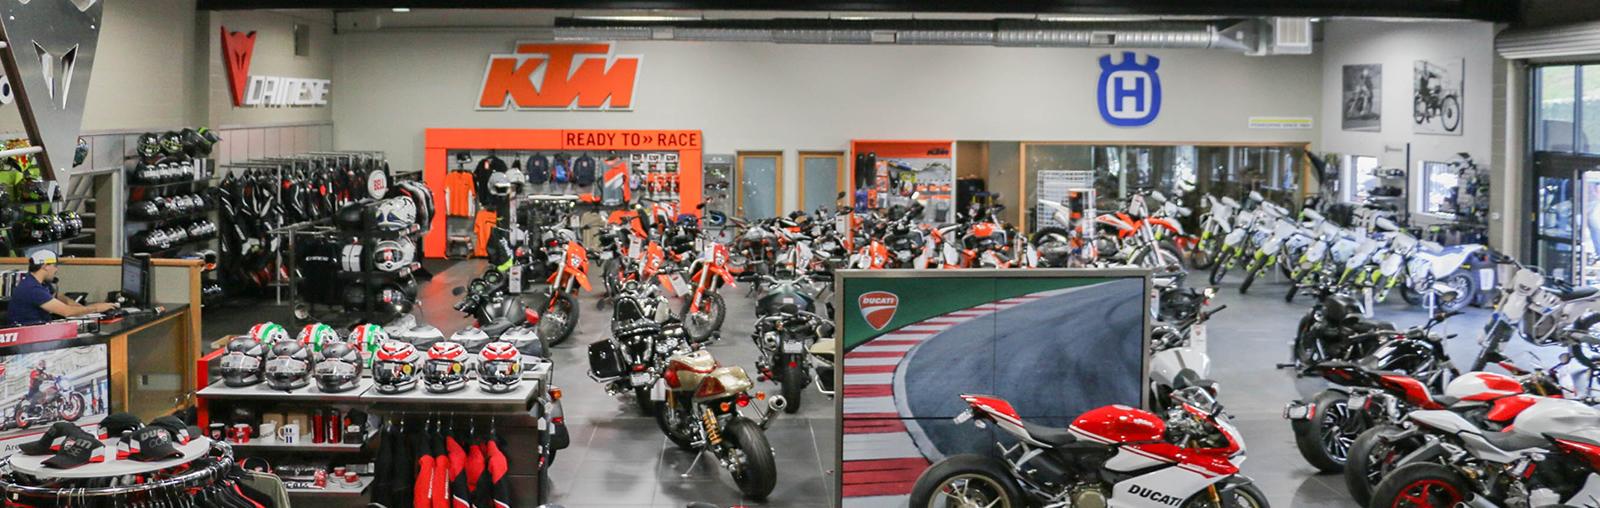 New_Showroom-Grand-Reopening.jpg